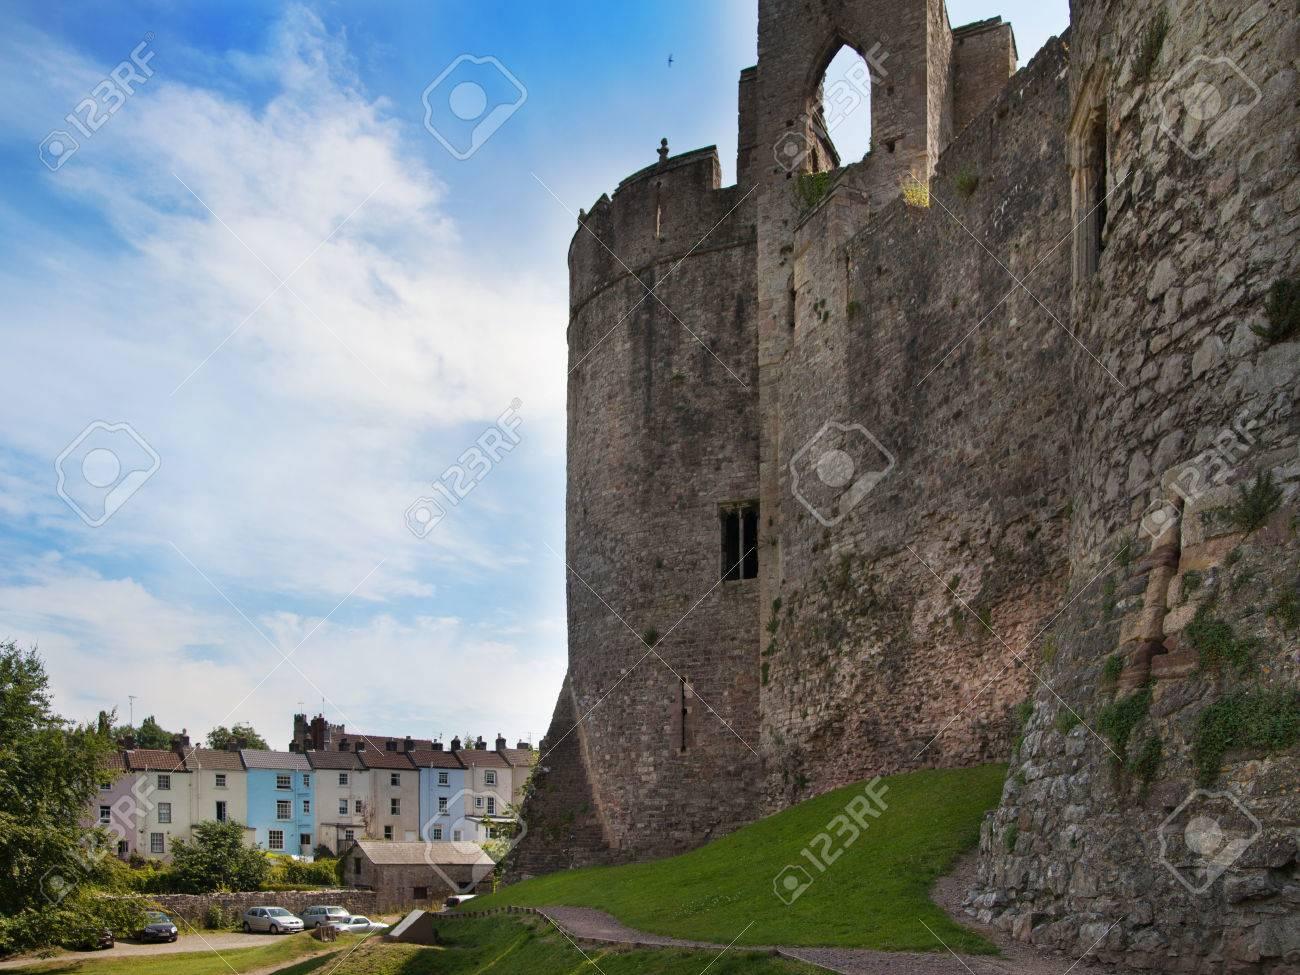 Castle Photography Chepstow Chepstow Castle Ruins